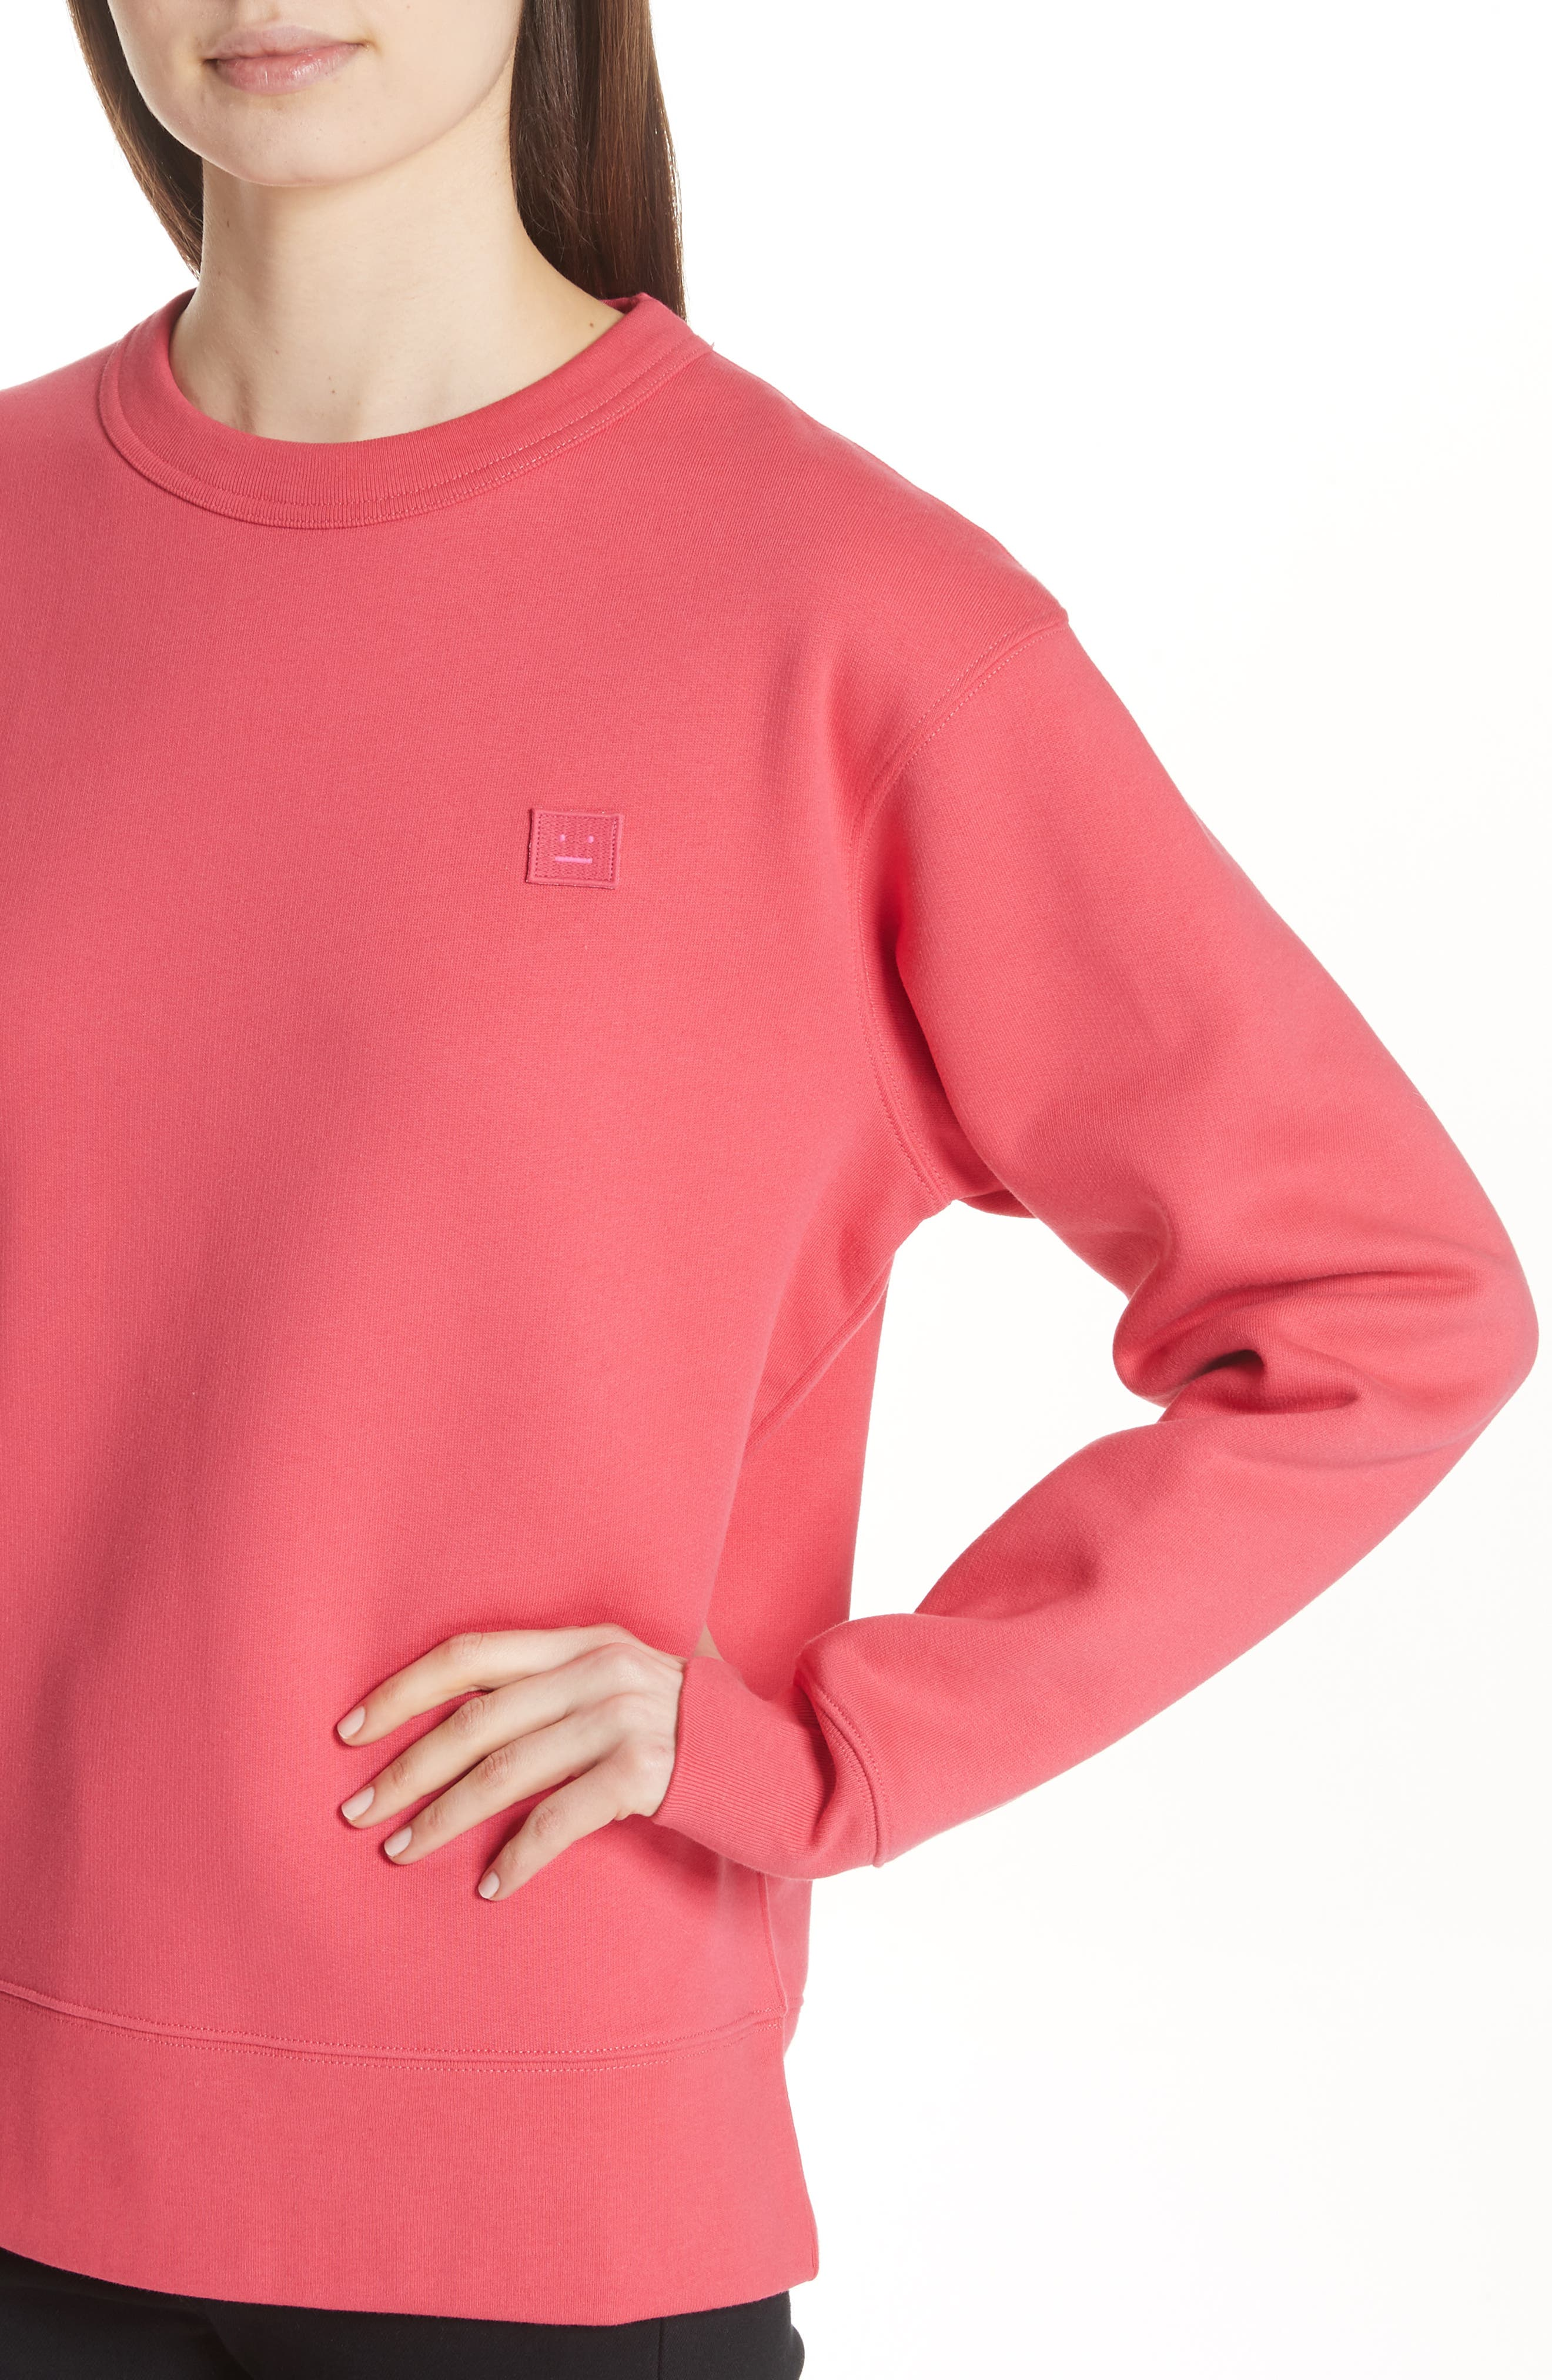 Fairview Crewneck Sweatshirt,                             Alternate thumbnail 4, color,                             Neon Pink